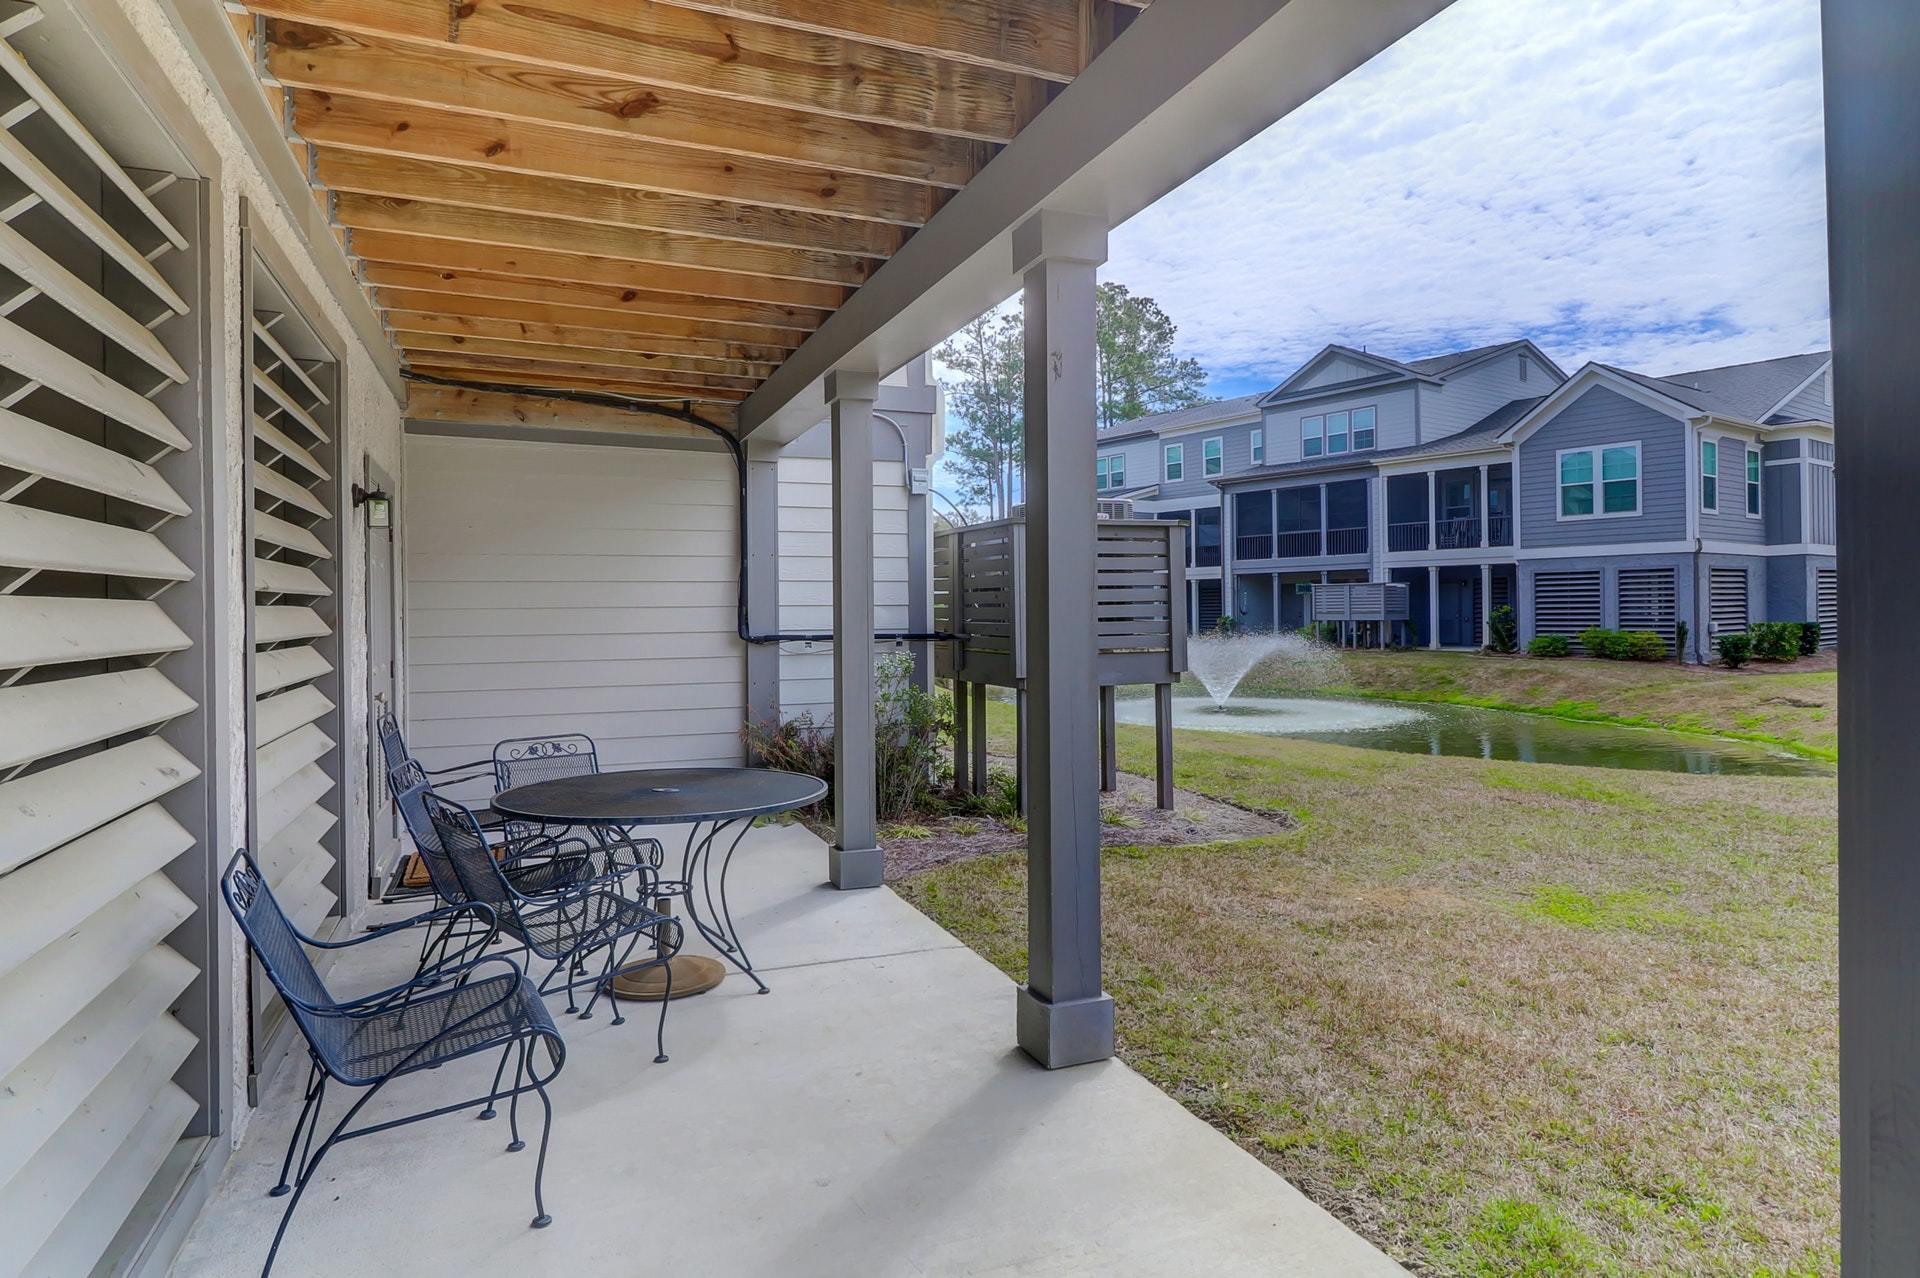 Etiwan Pointe Homes For Sale - 220 Slipper Shell, Mount Pleasant, SC - 10